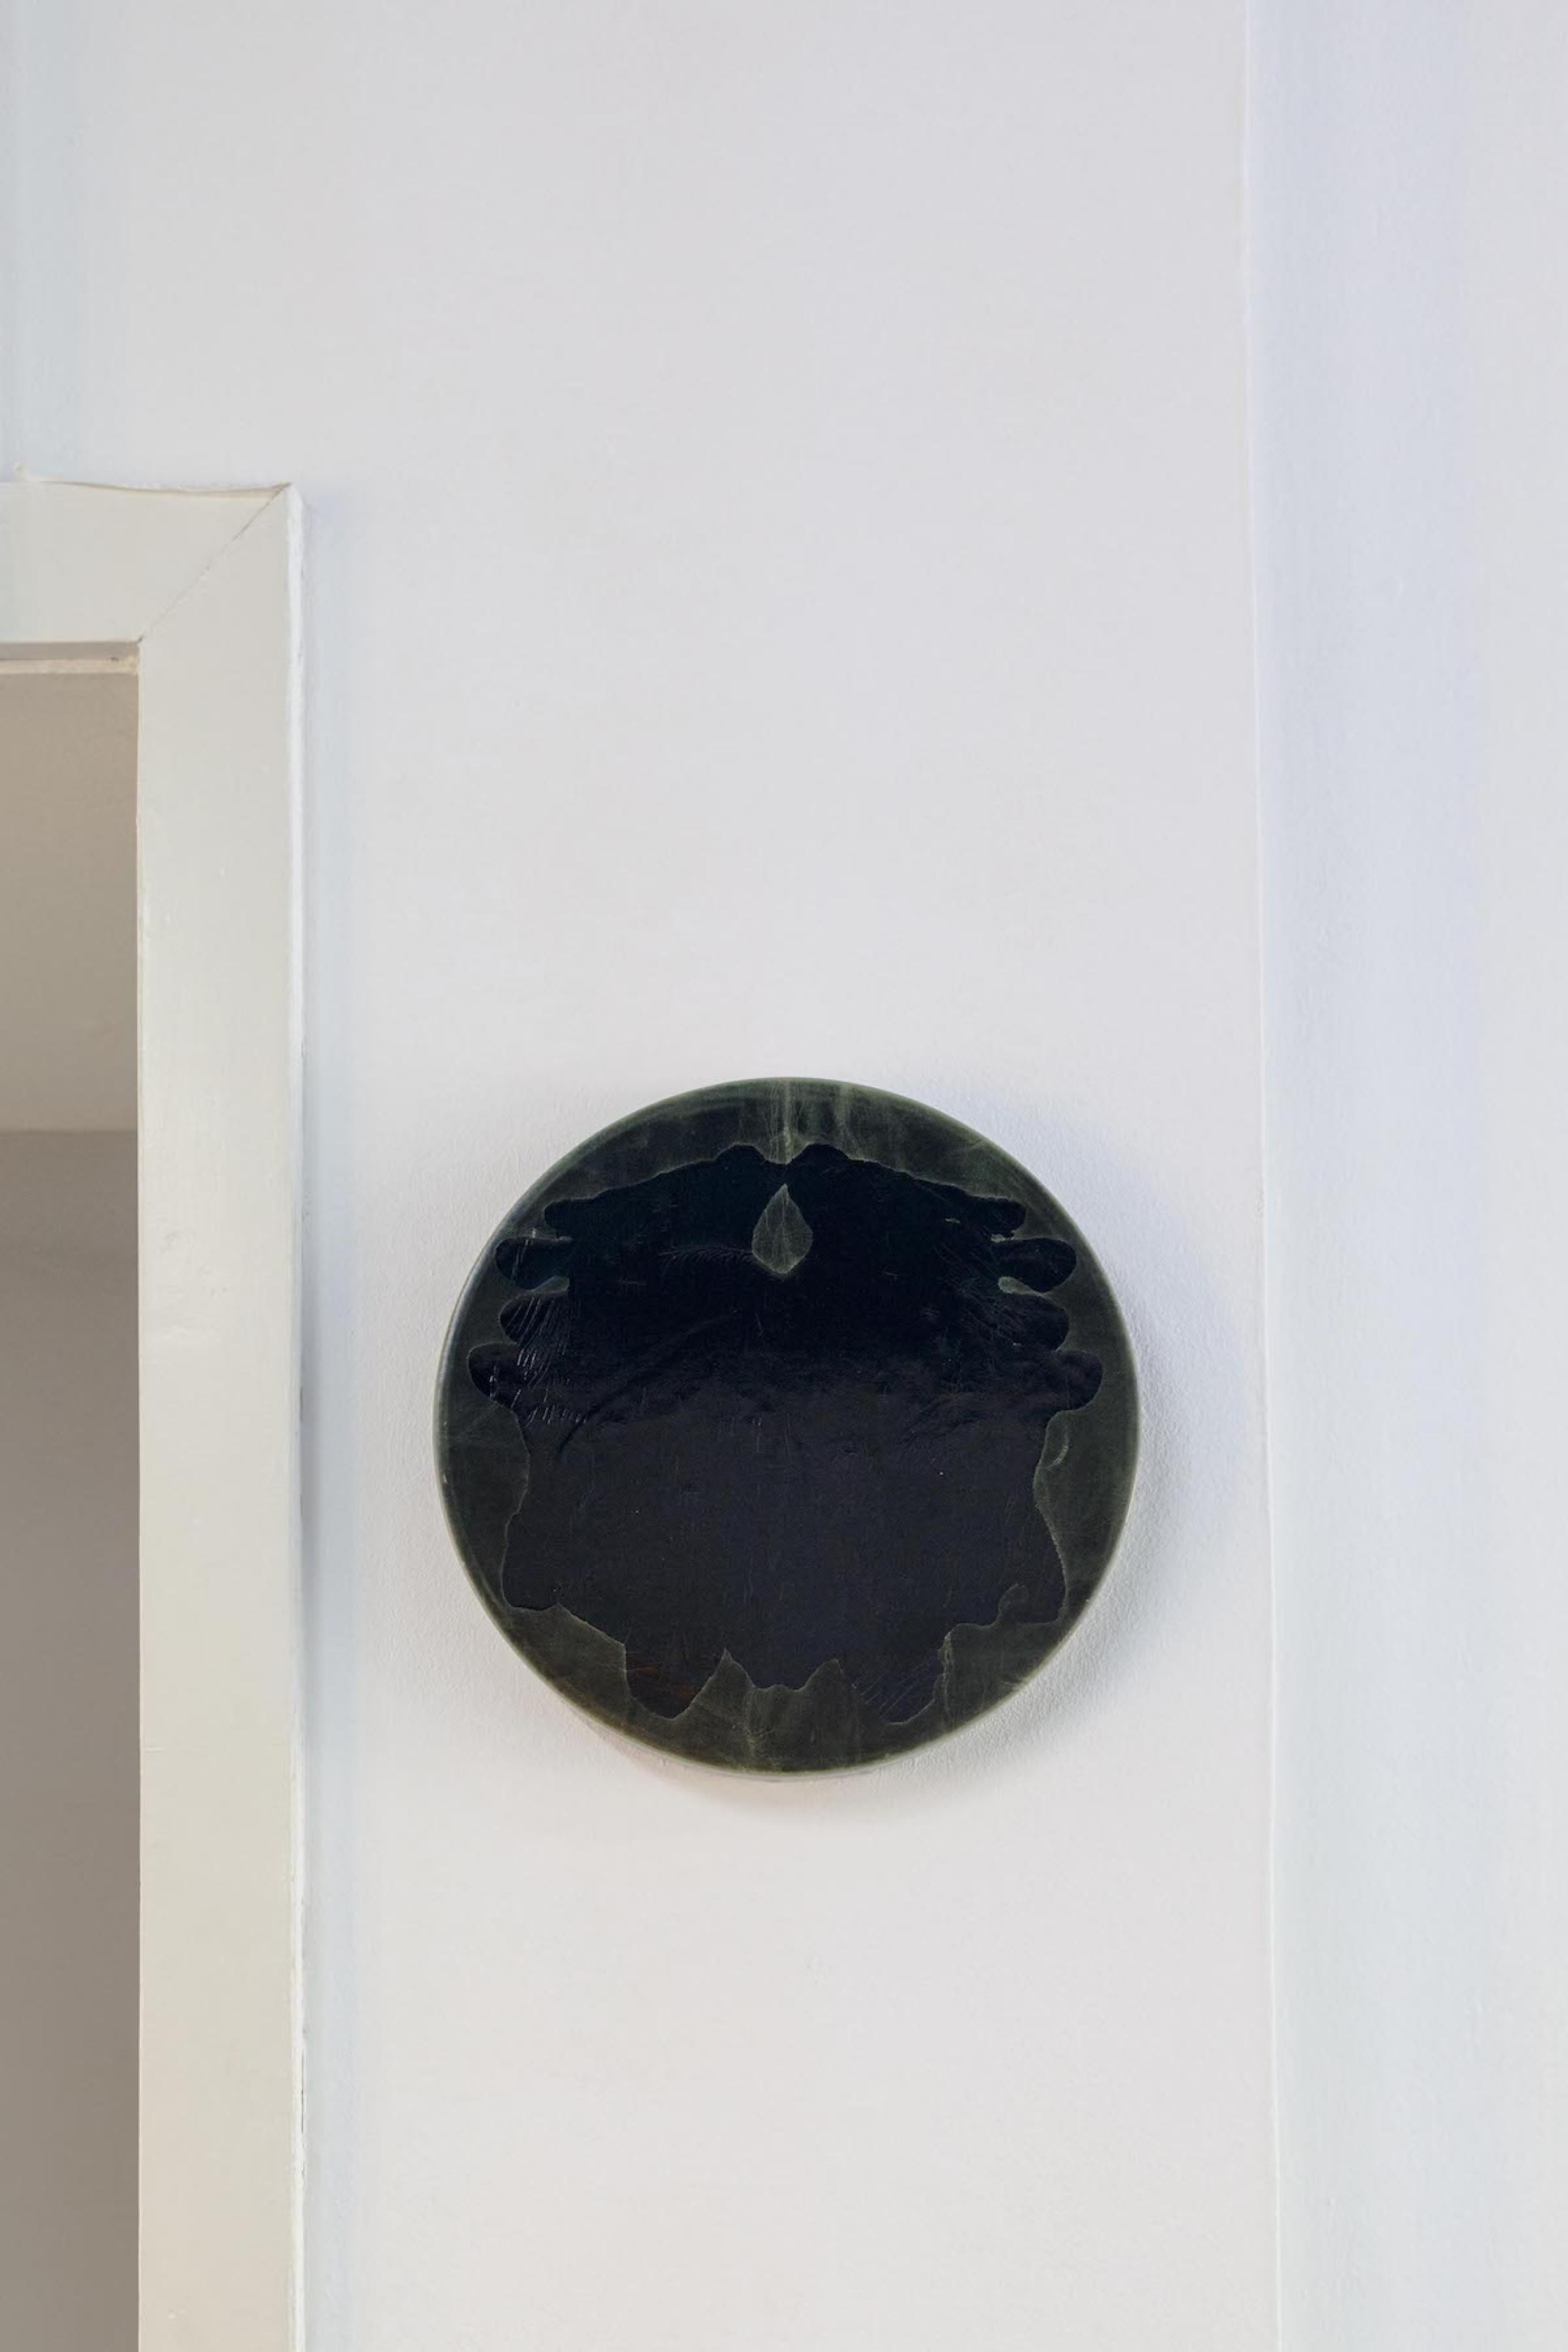 Marie Angeletti Untitled, 2017,Enamel screenprint on fabric,Courtesy of Édouard Montassut